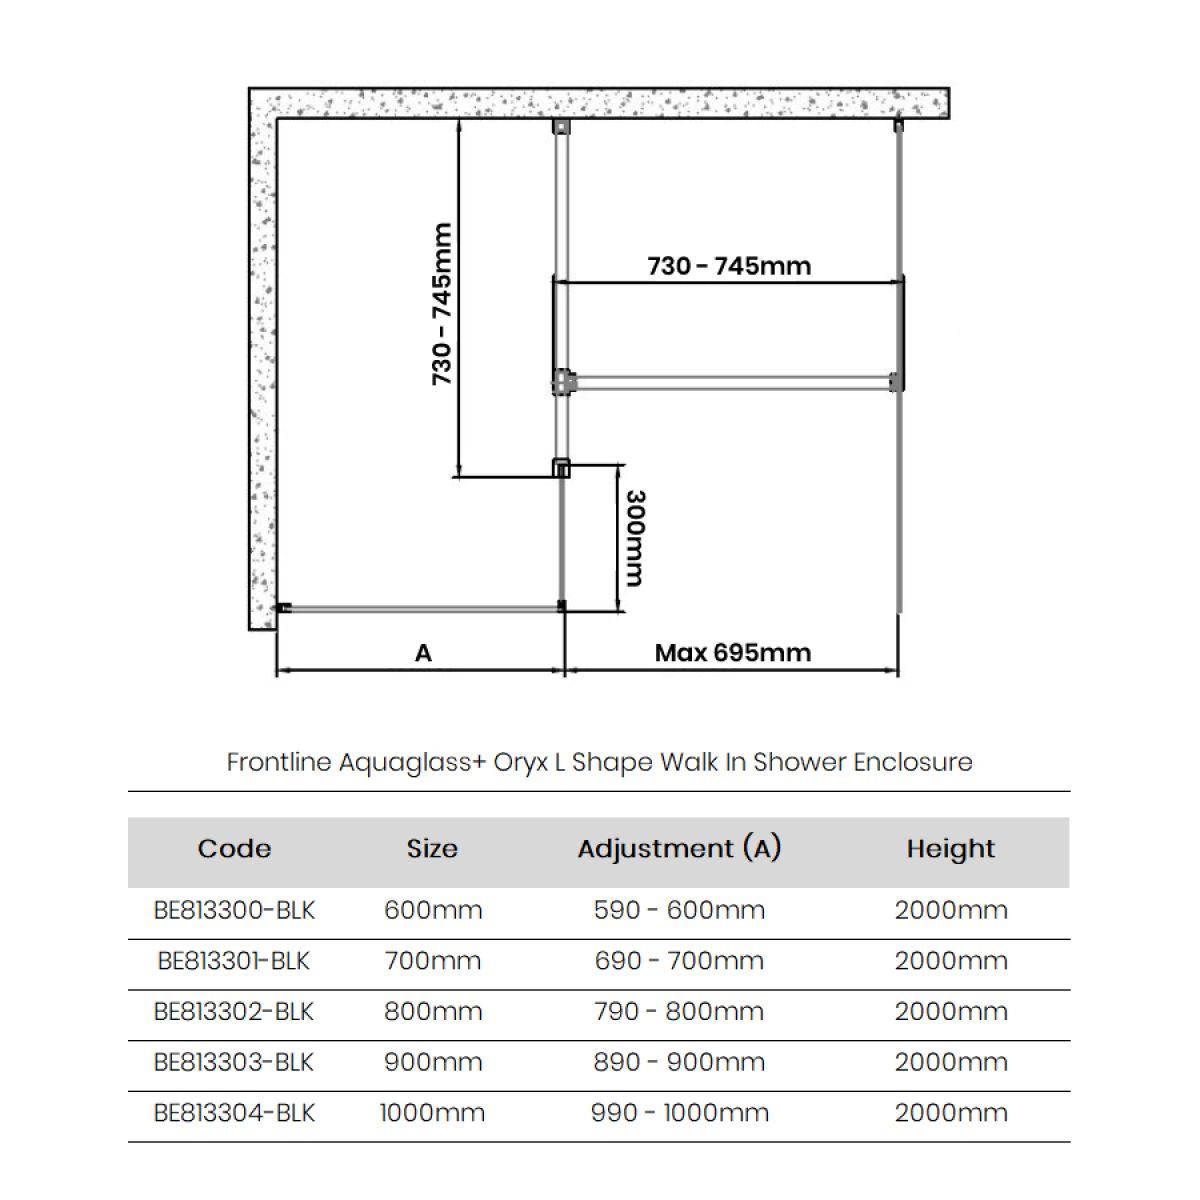 Frontline Aquaglass+ Onyx L Shape Walk In Shower Enclosure Dimensions